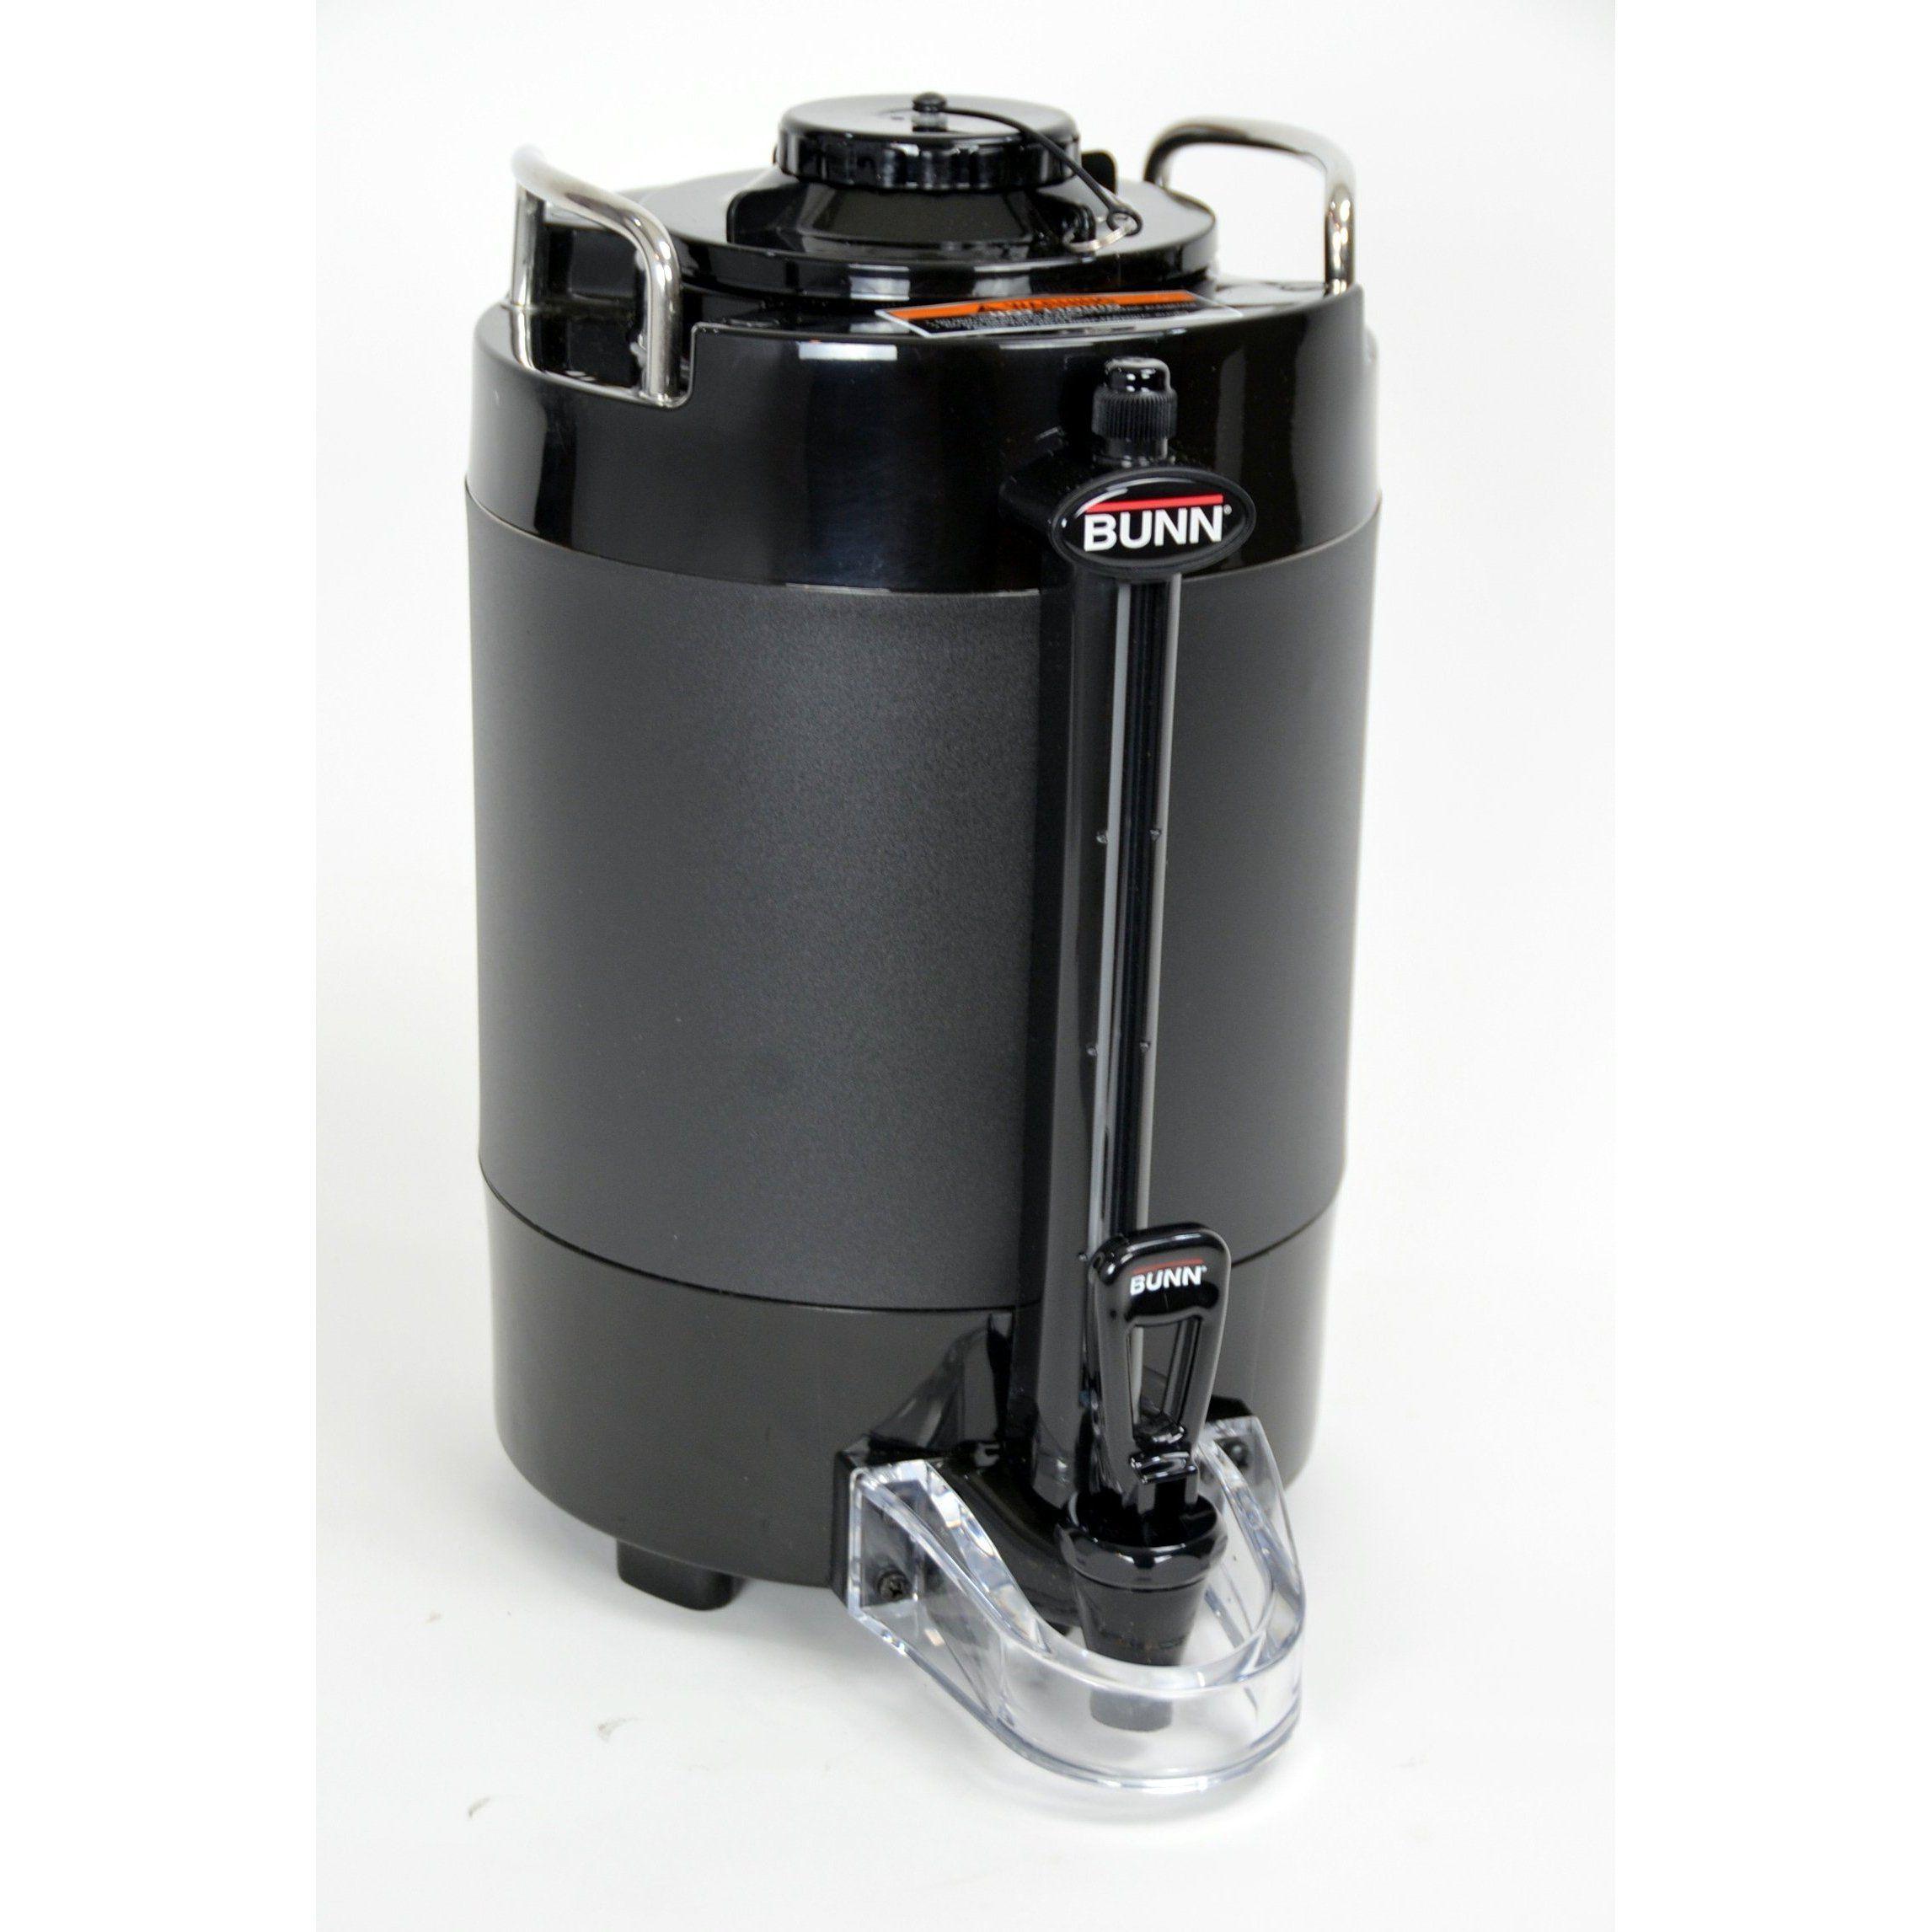 Bunn 44050.0051 TF 1.5 Gal Black ThermoFresh Coffee Server Dispenser NEW OPEN BOX #coffeeserver Bunn 44050.0051 TF 1.5 Gal Black ThermoFresh Coffee Server Dispenser NEW OPEN BOX #coffeeserver